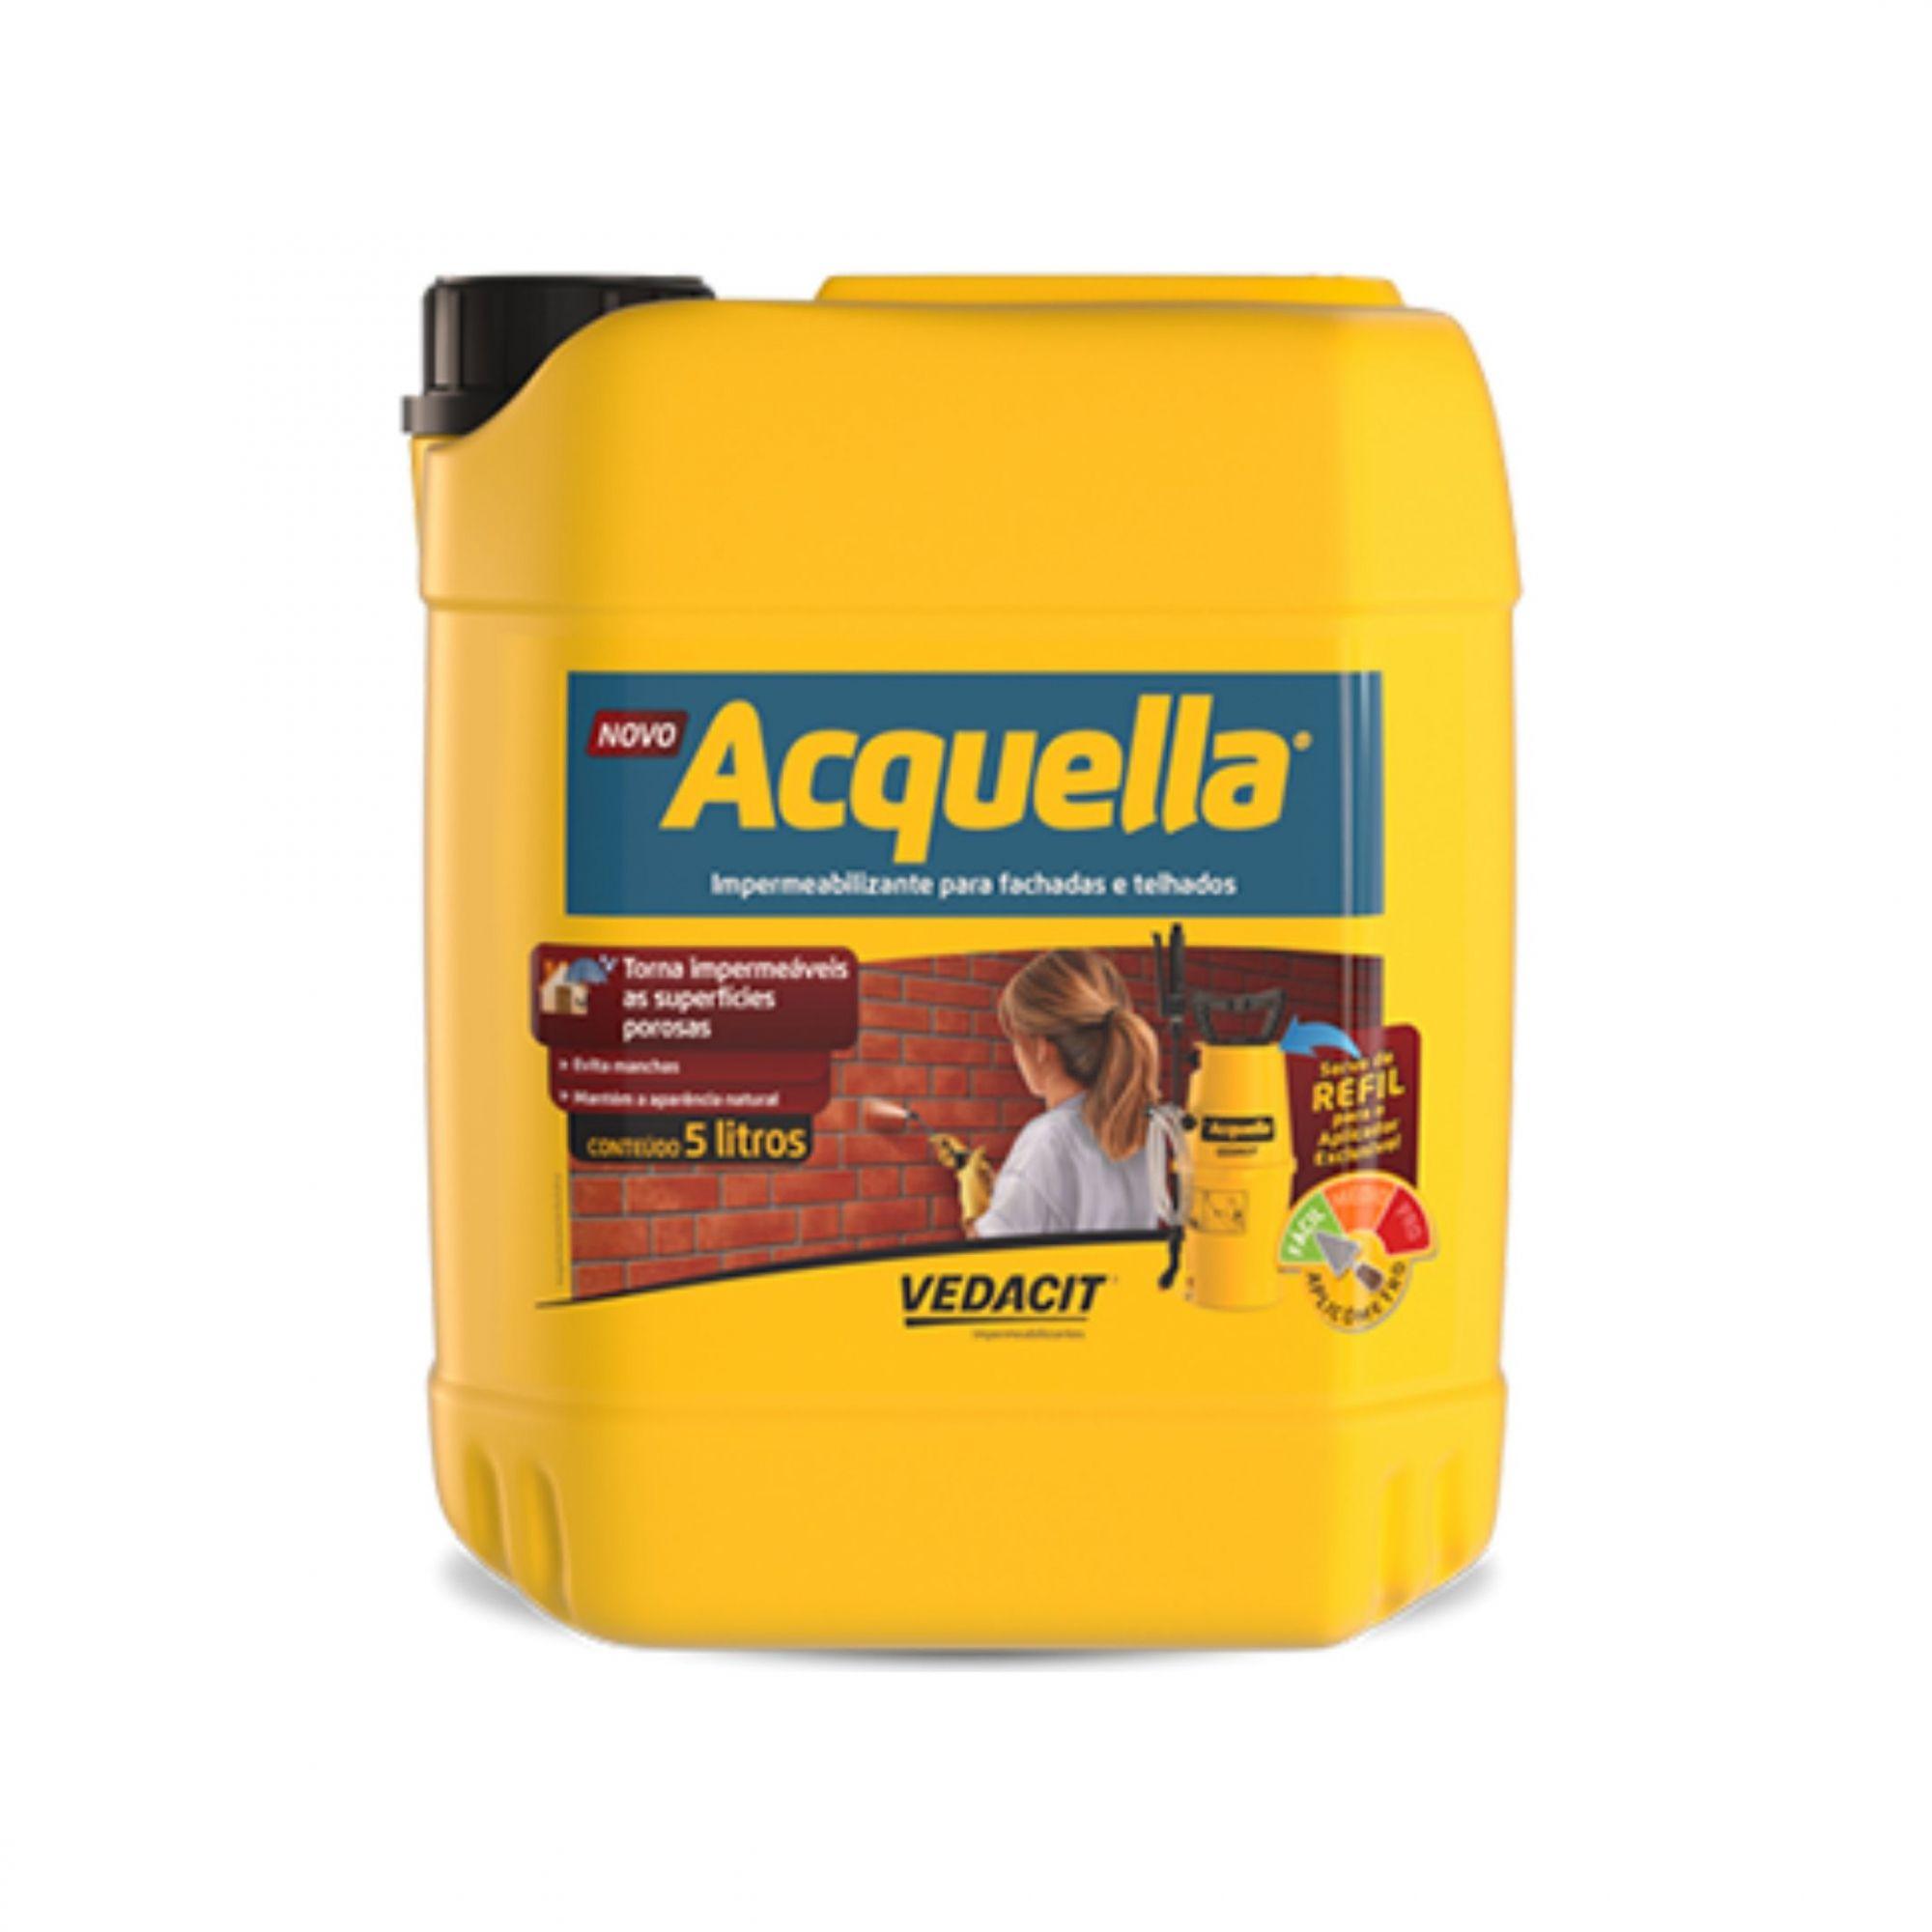 Impermeabilizante Acquella Bombona 5 Litros Vedacit